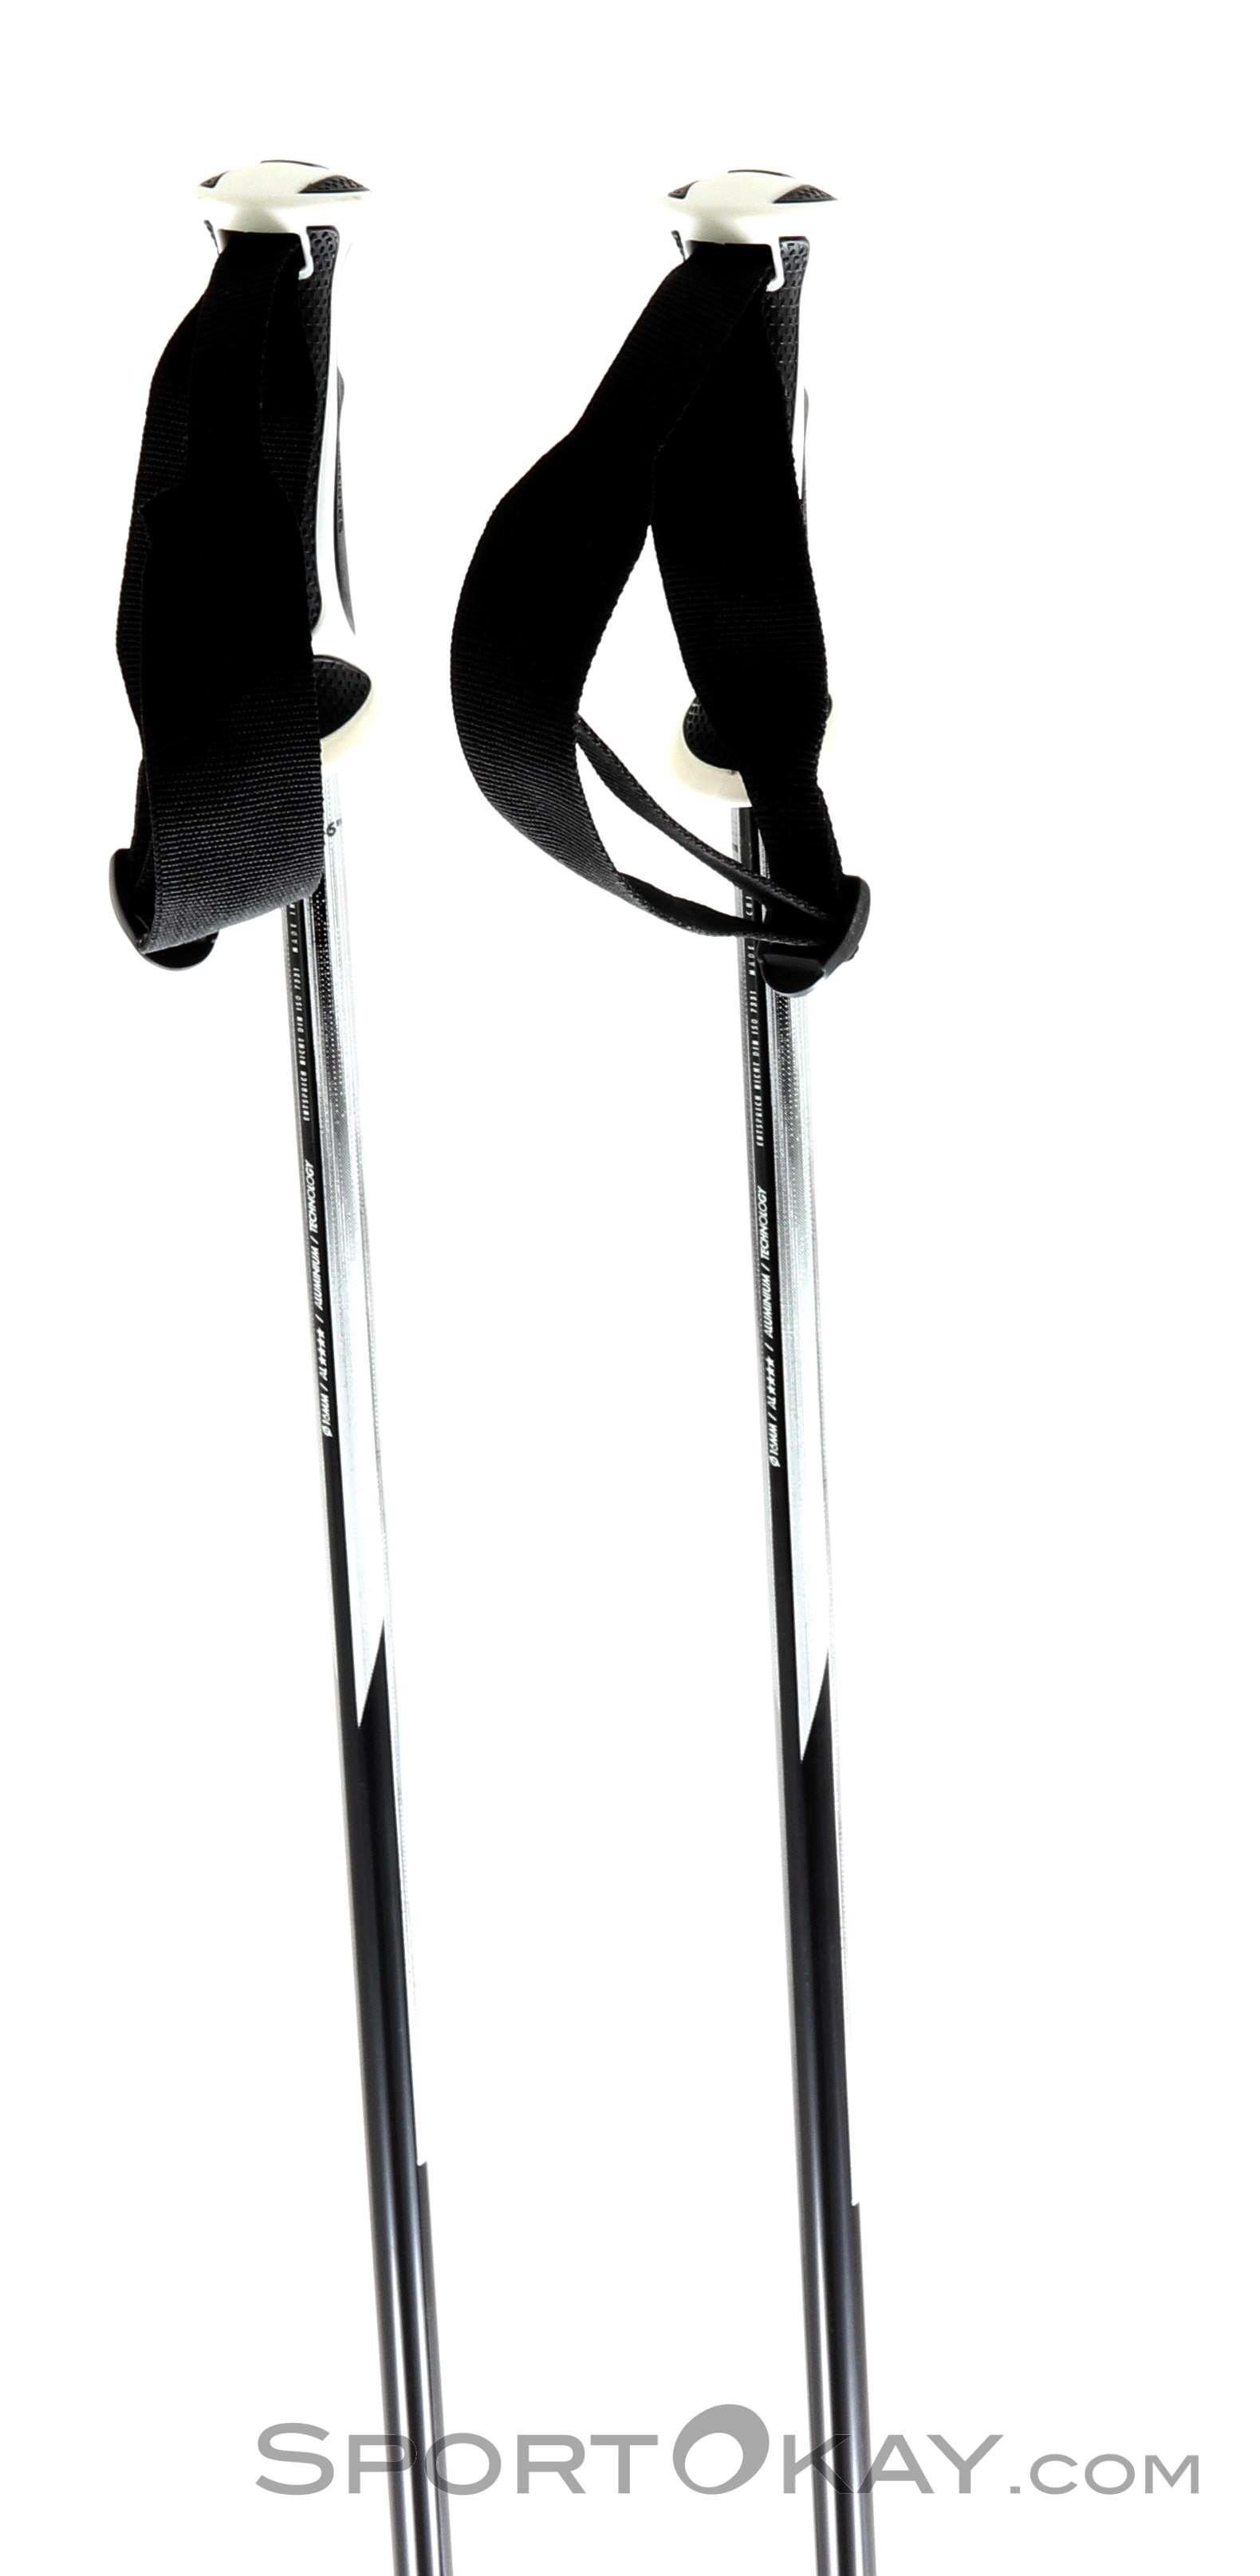 Salomon Shiva Alpine Ski Poles Black Size 100